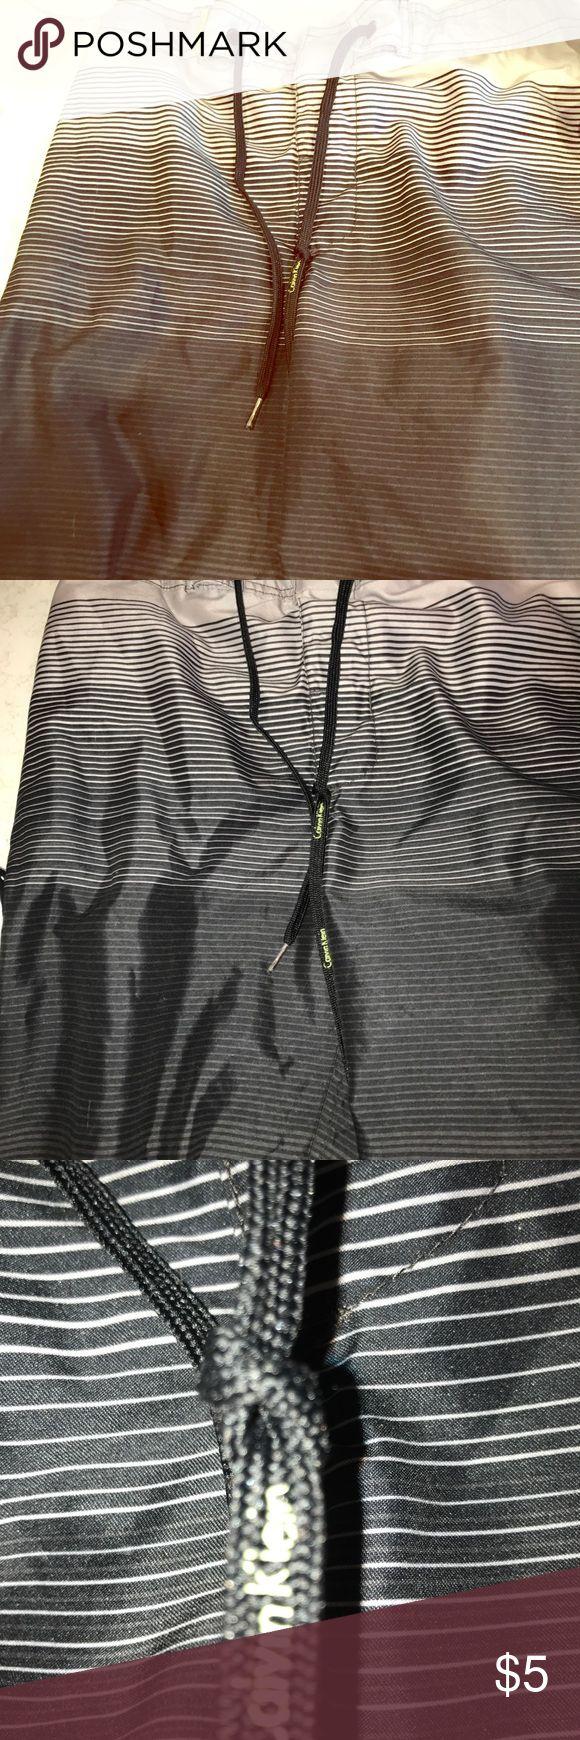 Calvin Klein swim shirt size M Amazing swim shorts very high quality regularly $60 Calvin Klein Shorts Athletic